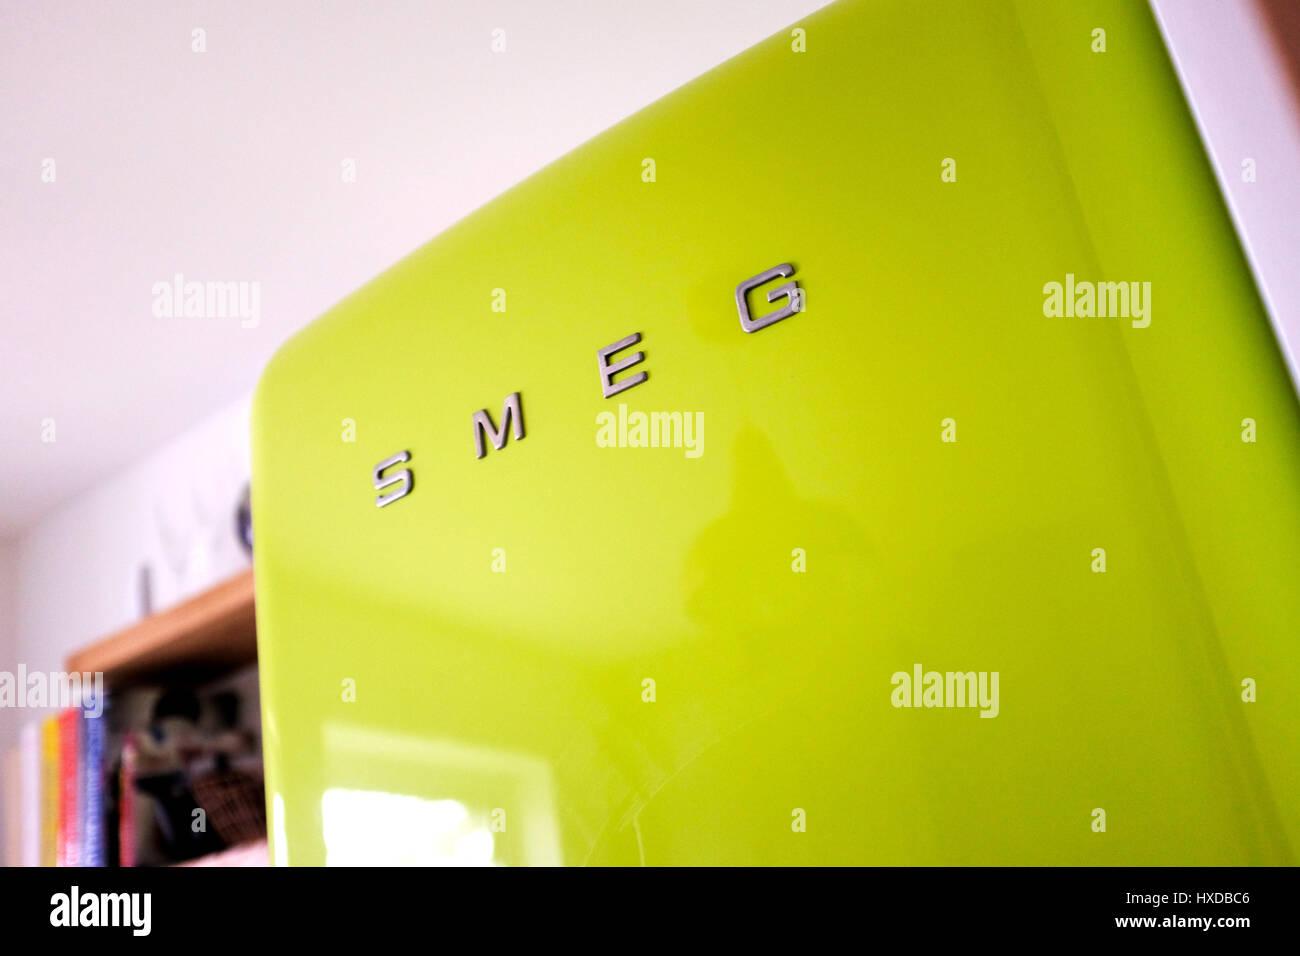 Smeg Kühlschrank Verkaufen : Smeg fridge stockfotos & smeg fridge bilder alamy